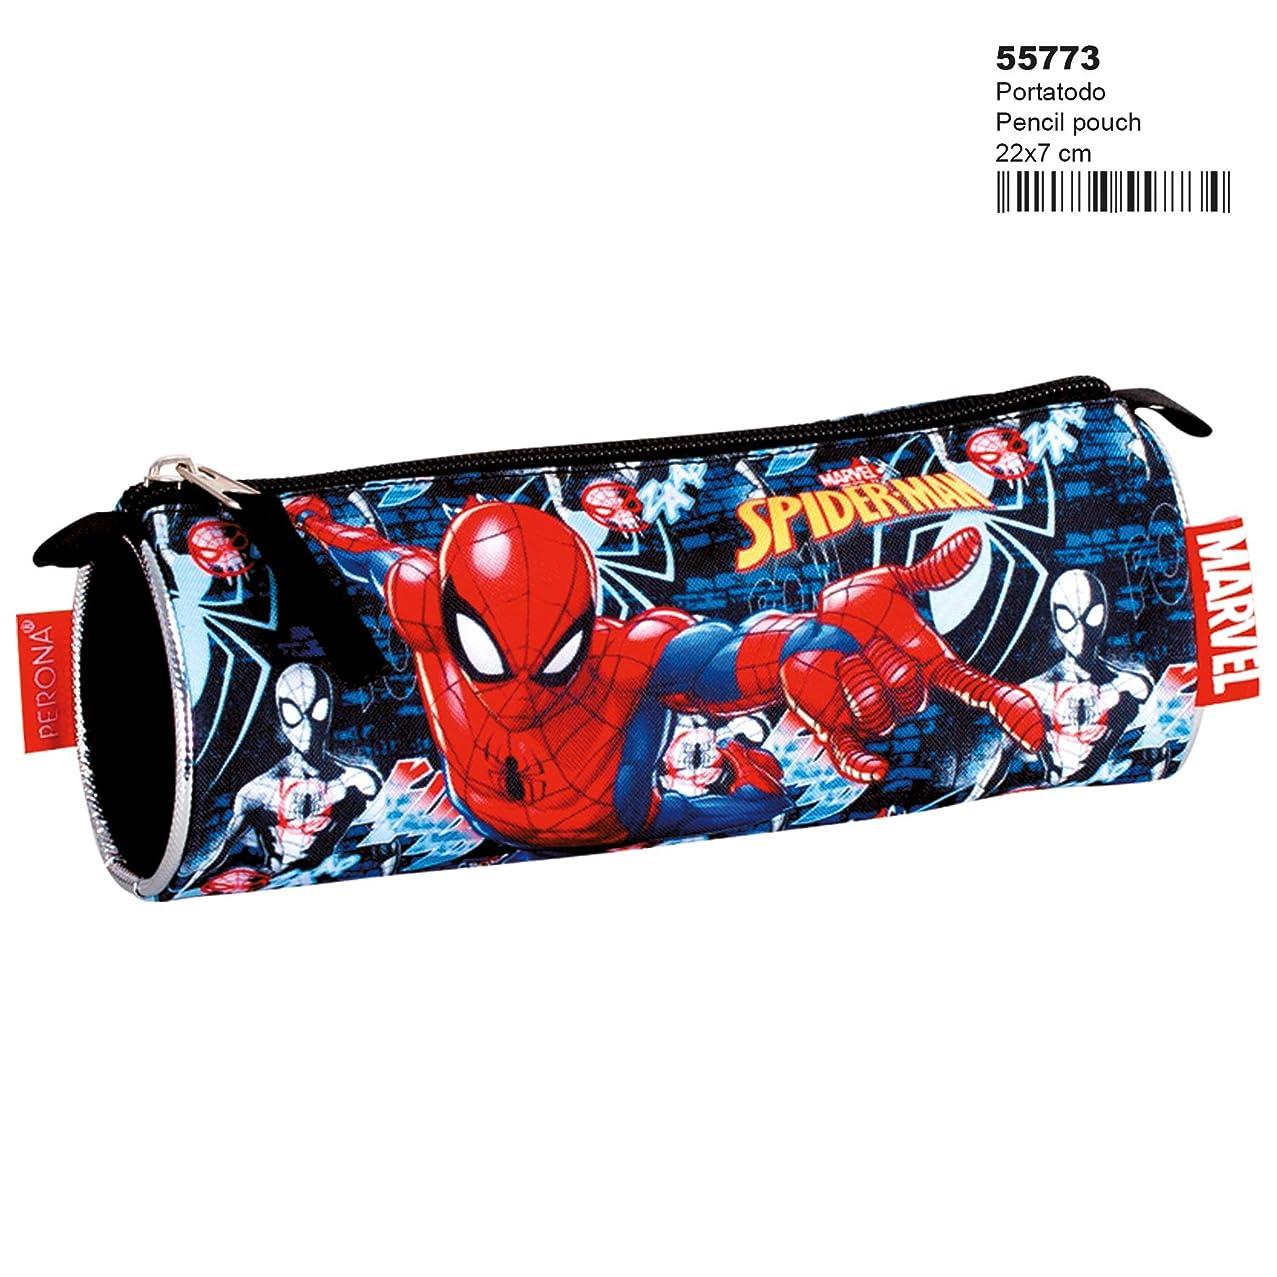 Marvel Spiderman - 'Radioactive' Round Pencil Cases, 22 cm, Multicolour